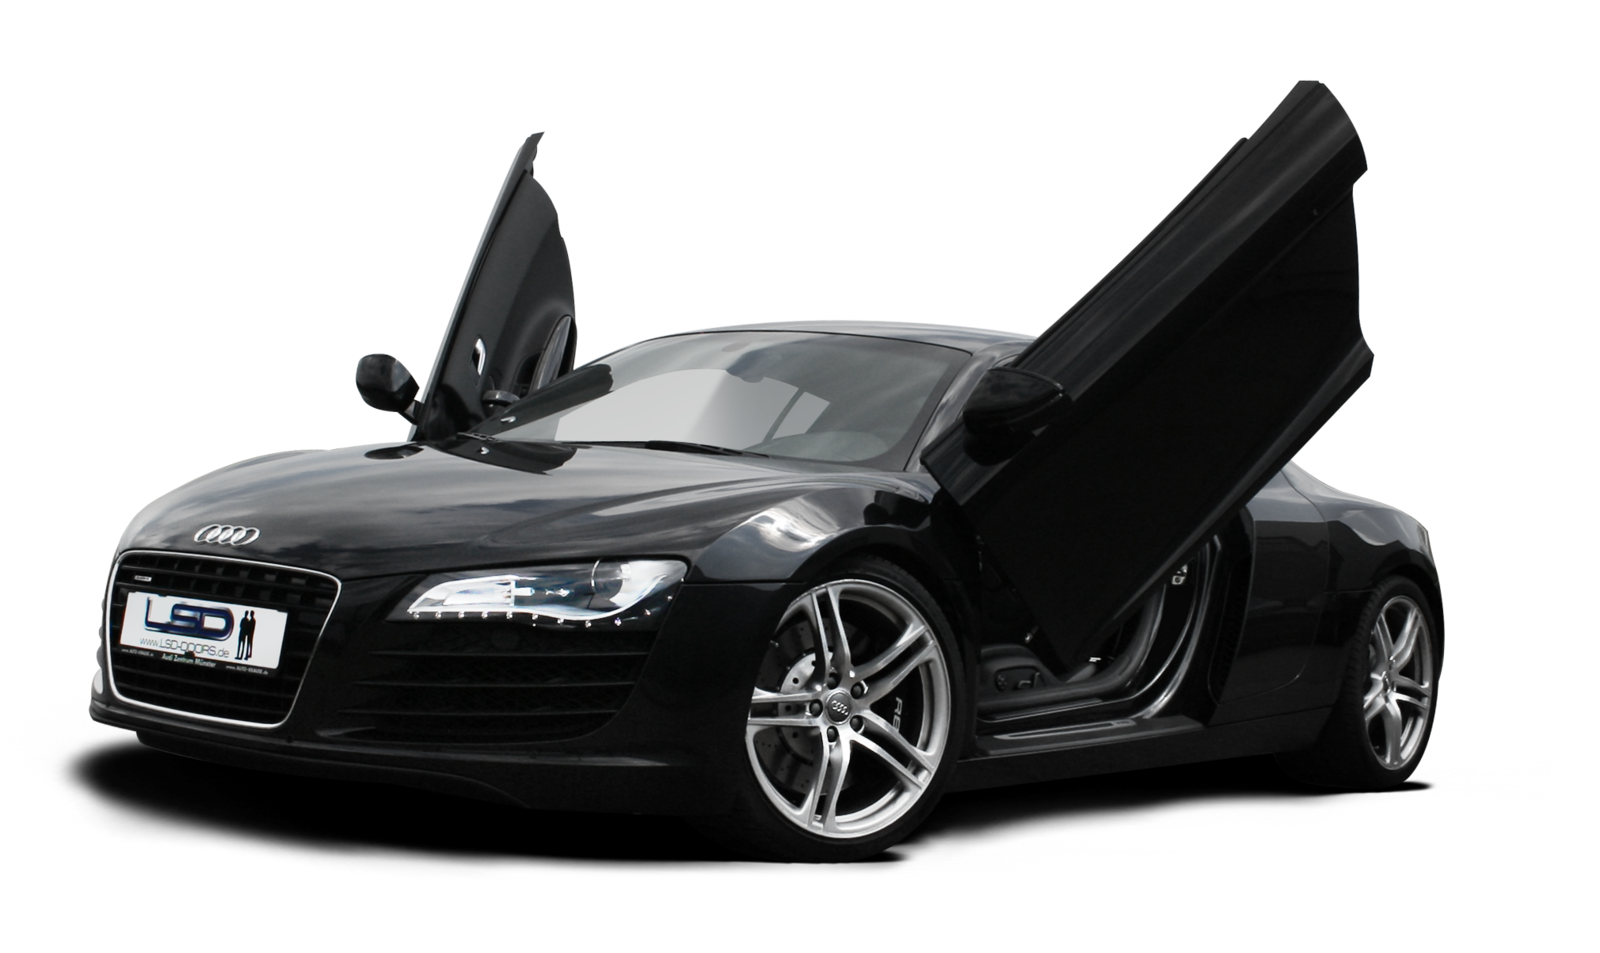 PNG HD Of Car Transparent HD Of Car.PNG Images..